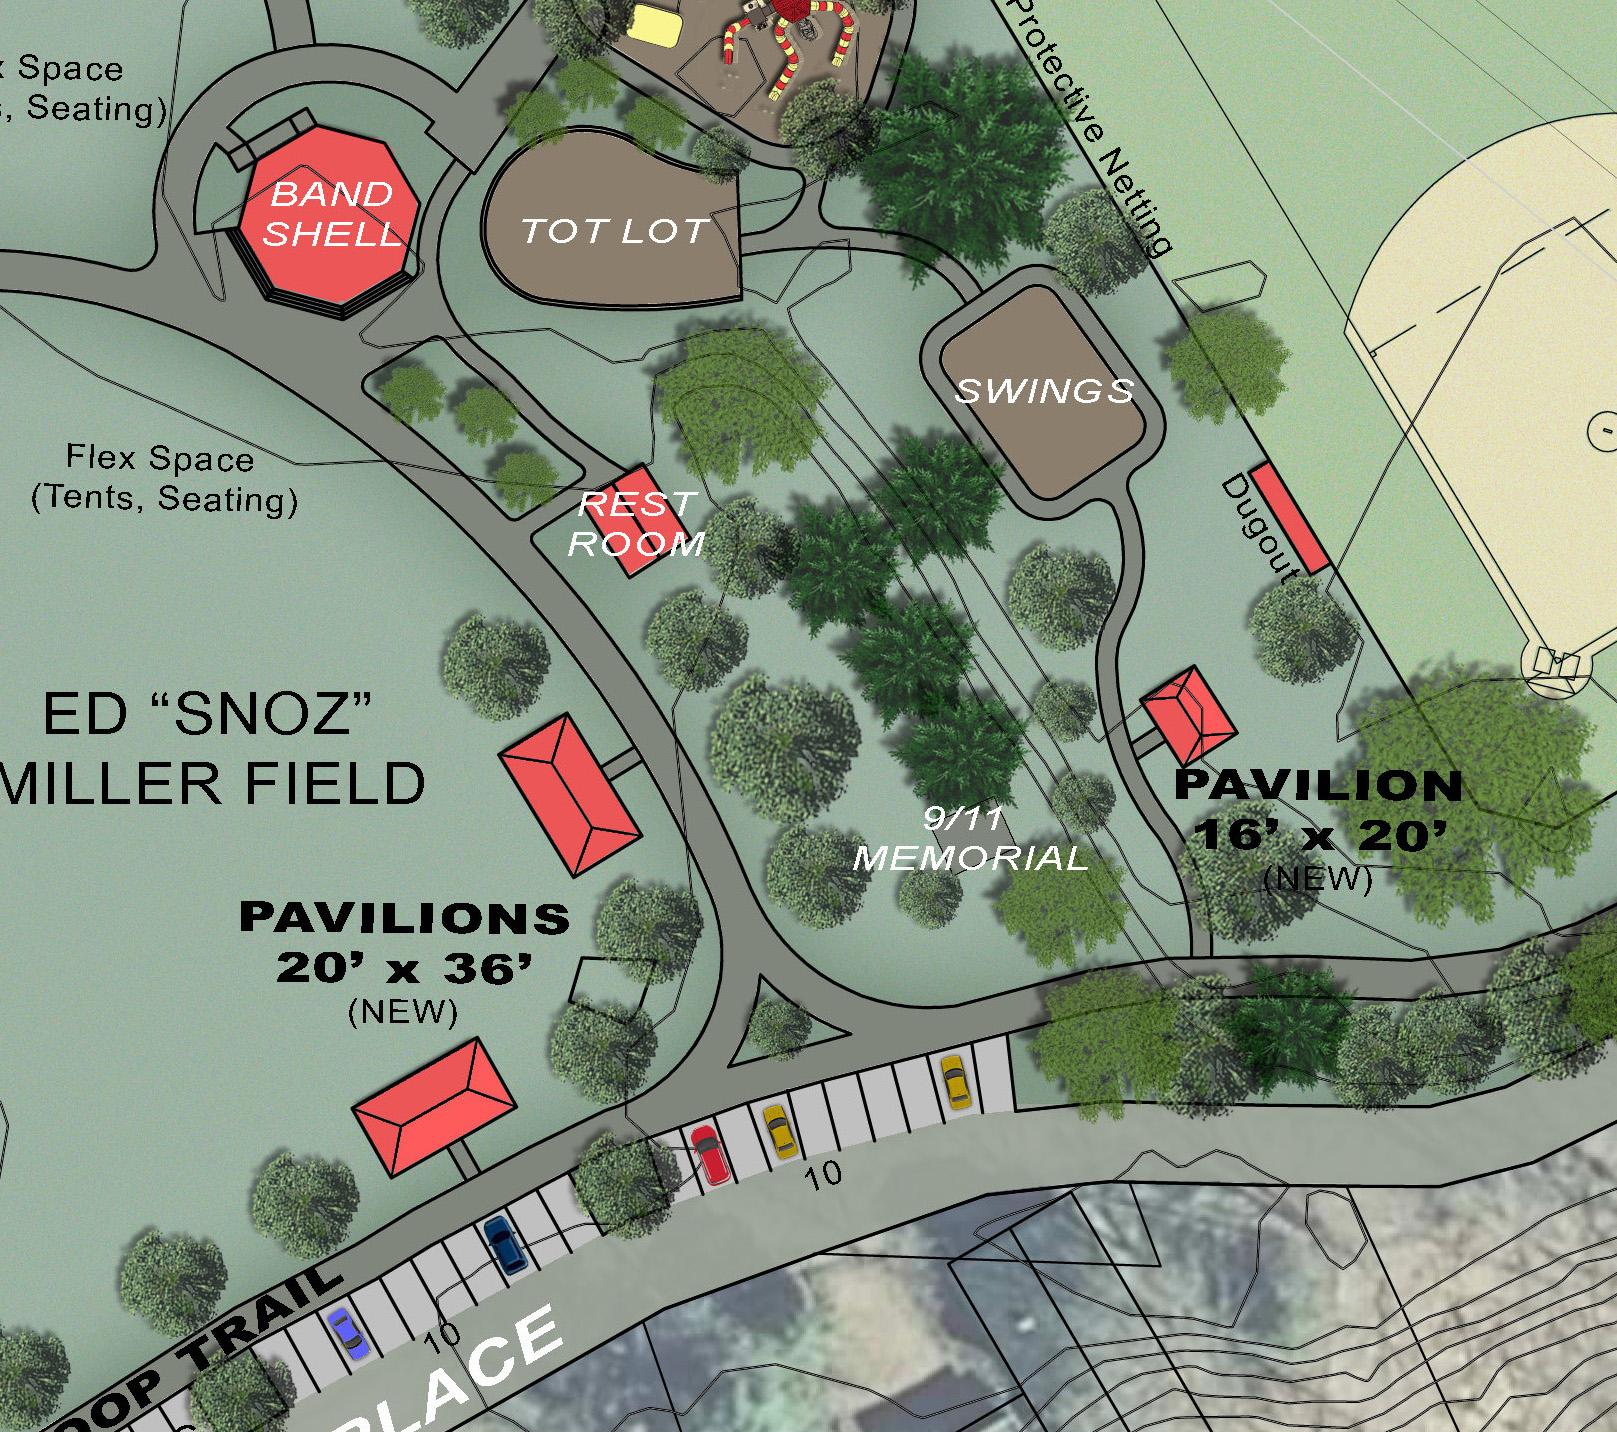 Proposed Gazebo Repairs & New Pavilions -